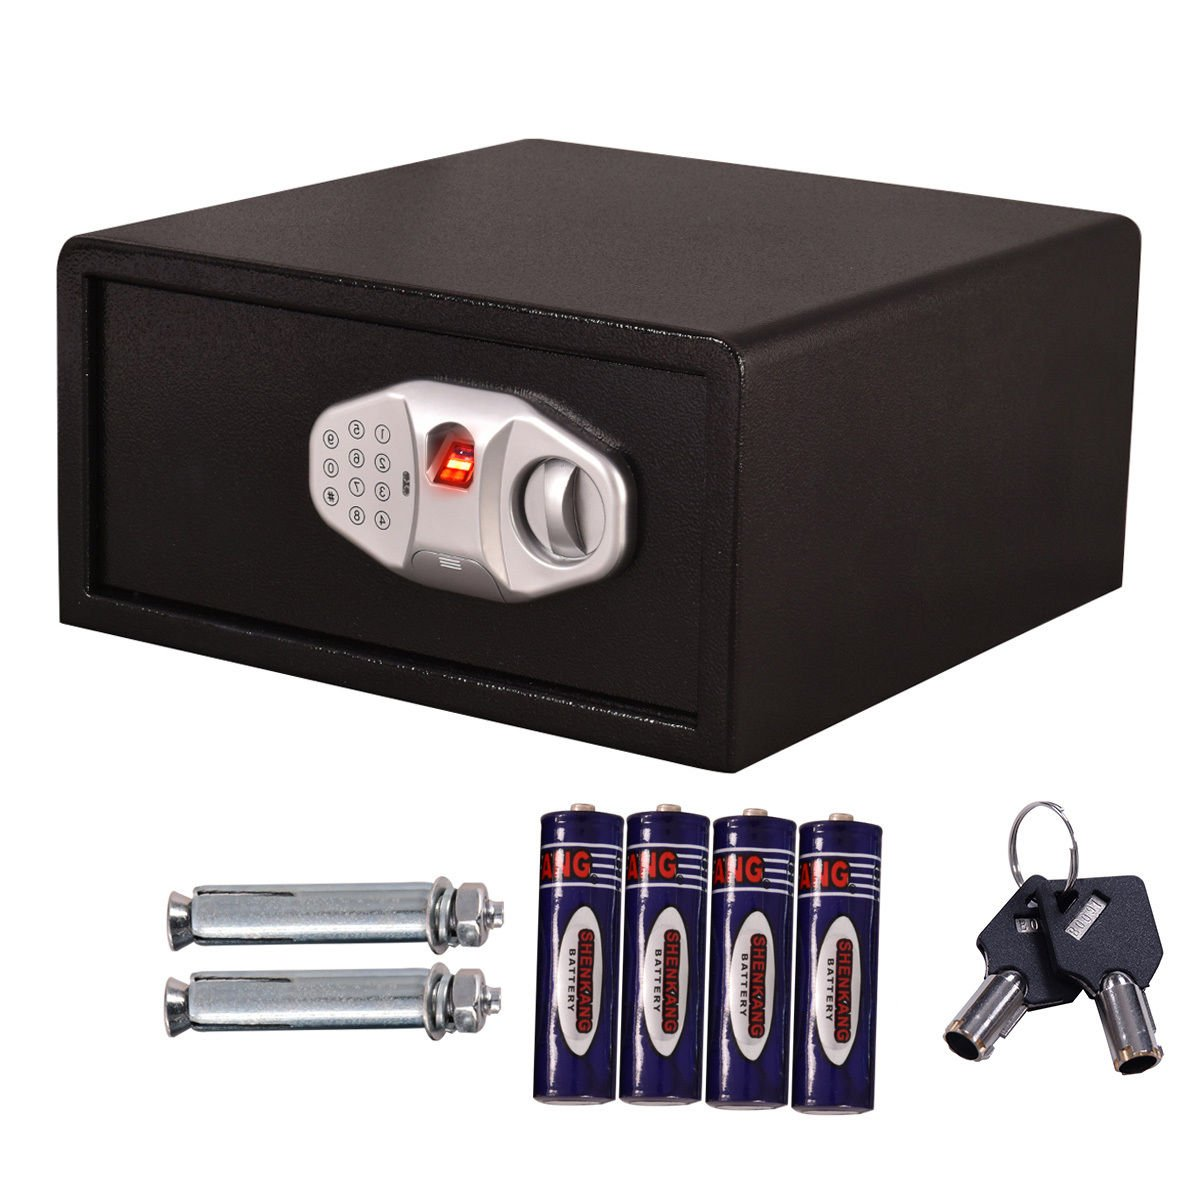 Safstar Security Safe Biometric Fingerprint Electronic Digital Keypad Lock Wall Cabinet for Money Gun Jewelry(FS Style: 15.7'' x 15.7'' x 7.8)